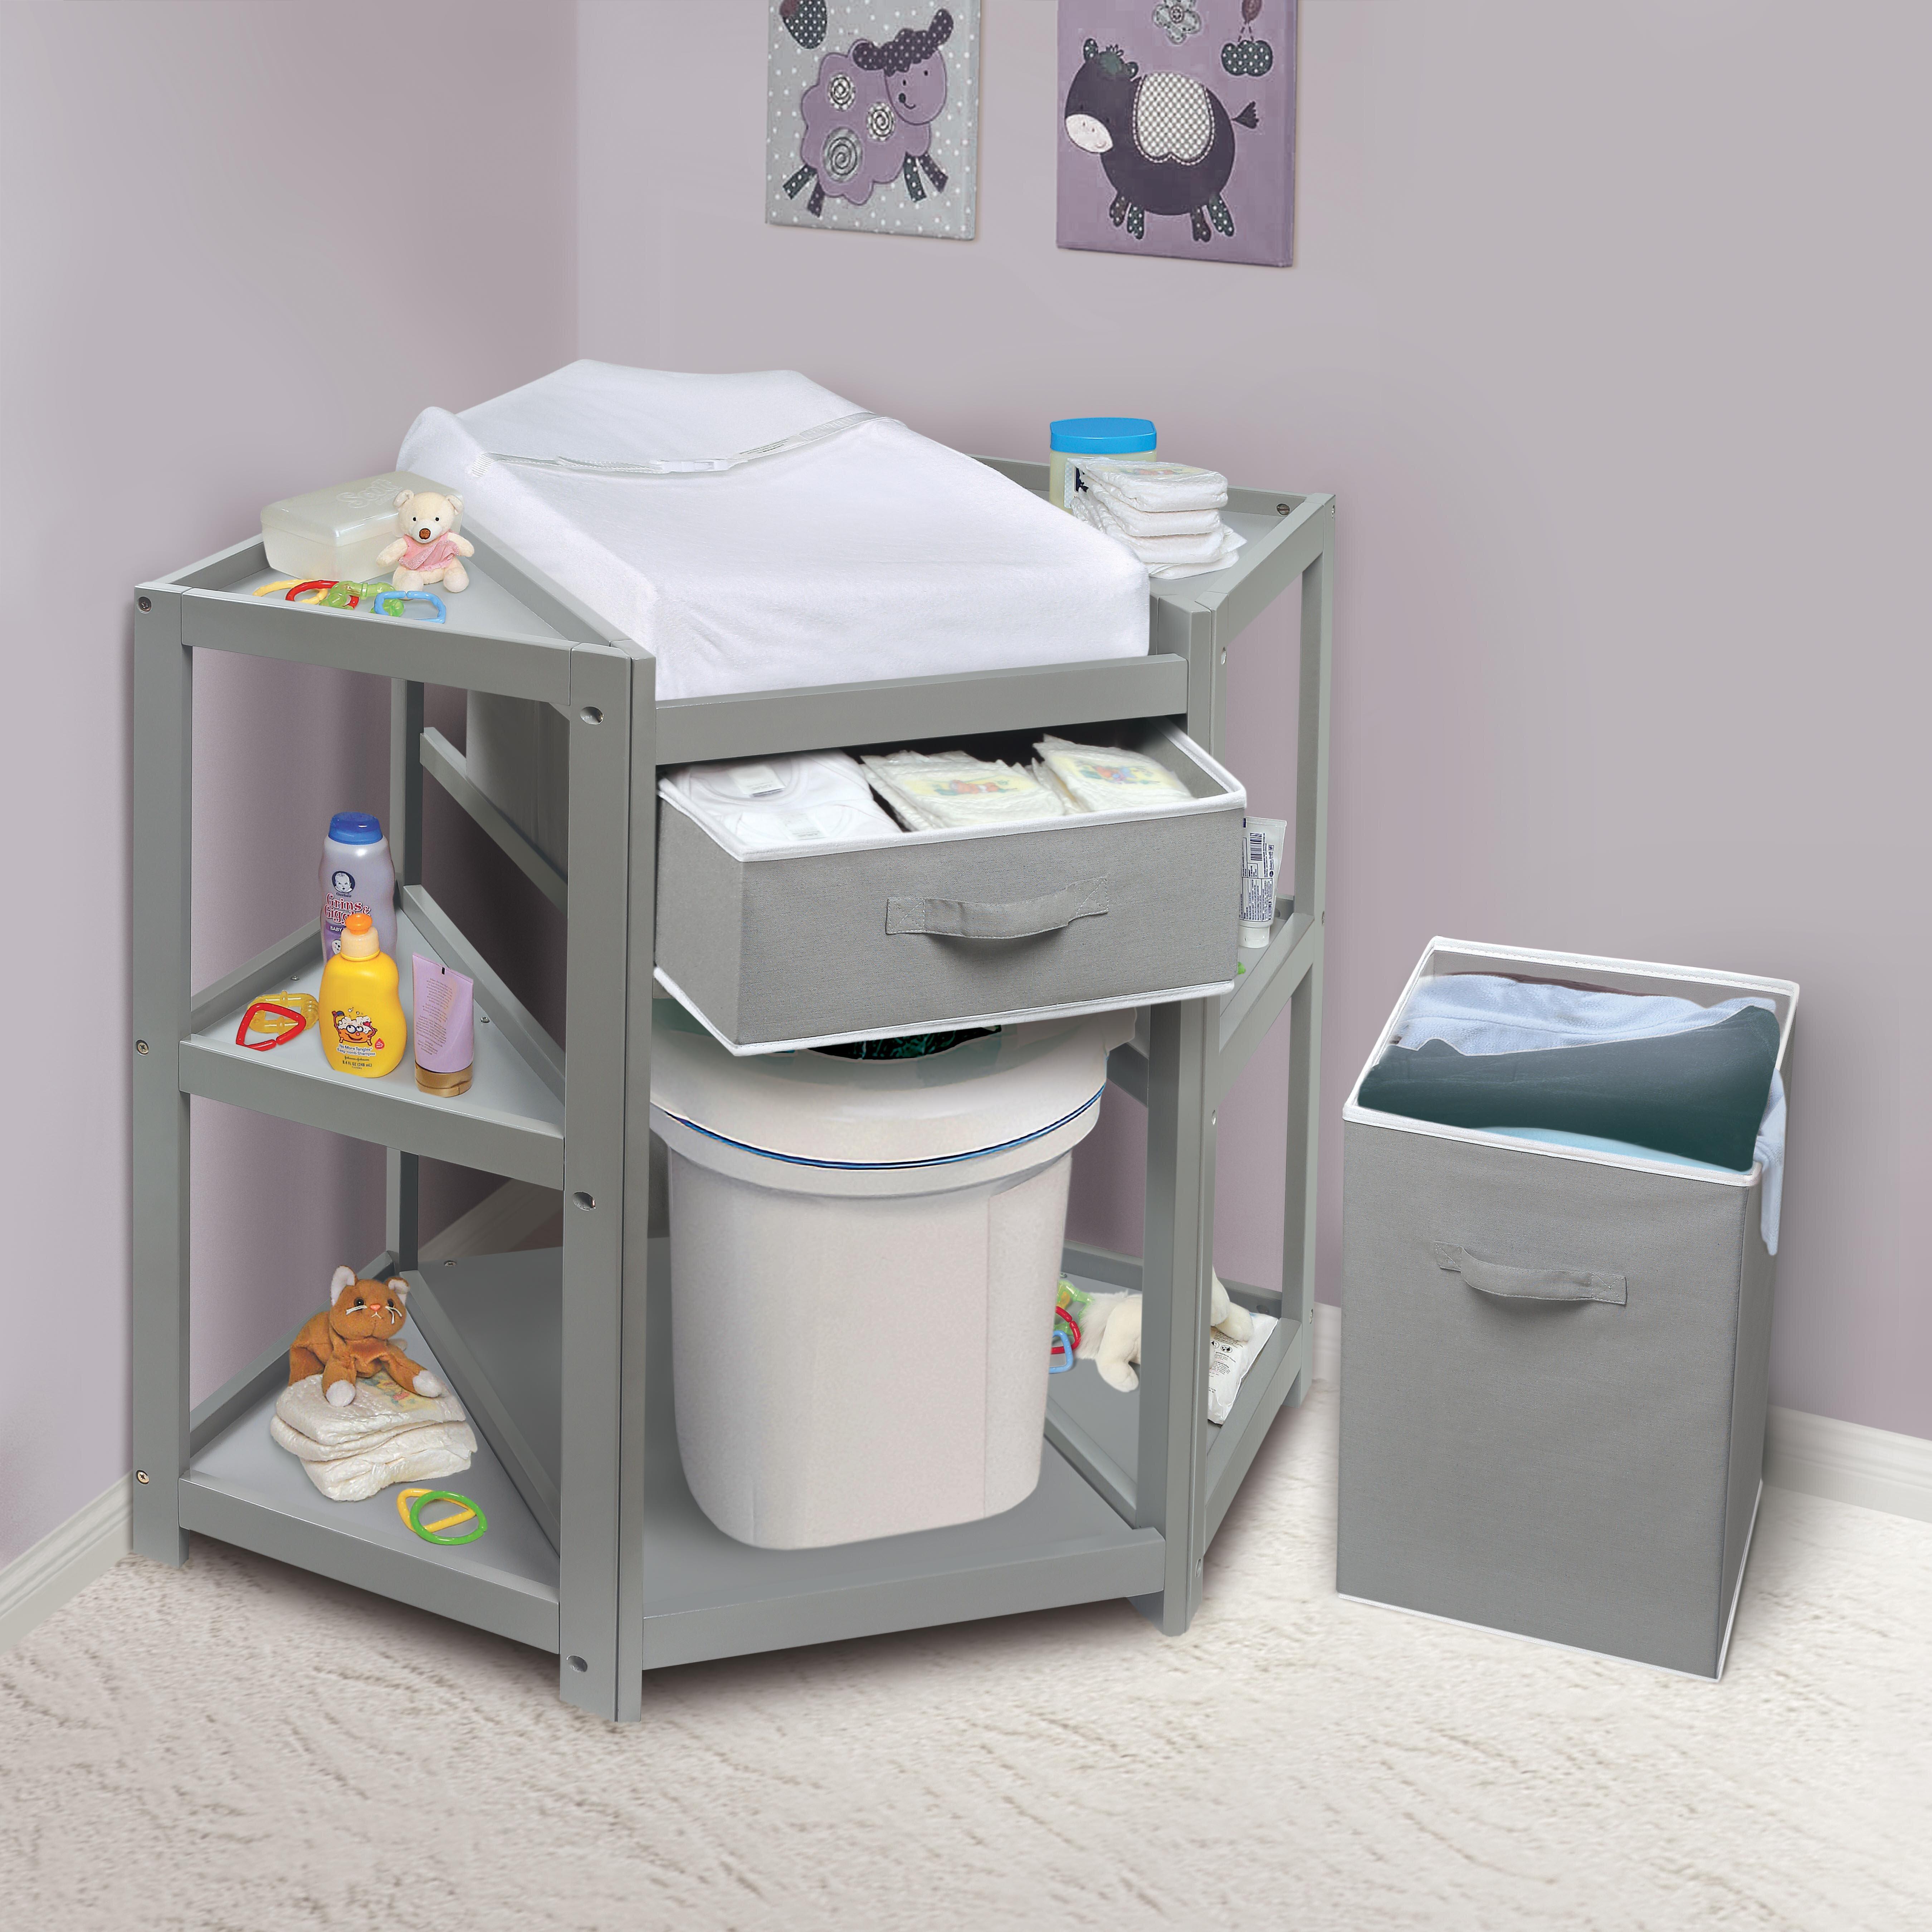 Badger Basket Diaper Corner Baby Changing Table U0026 Reviews | Wayfair